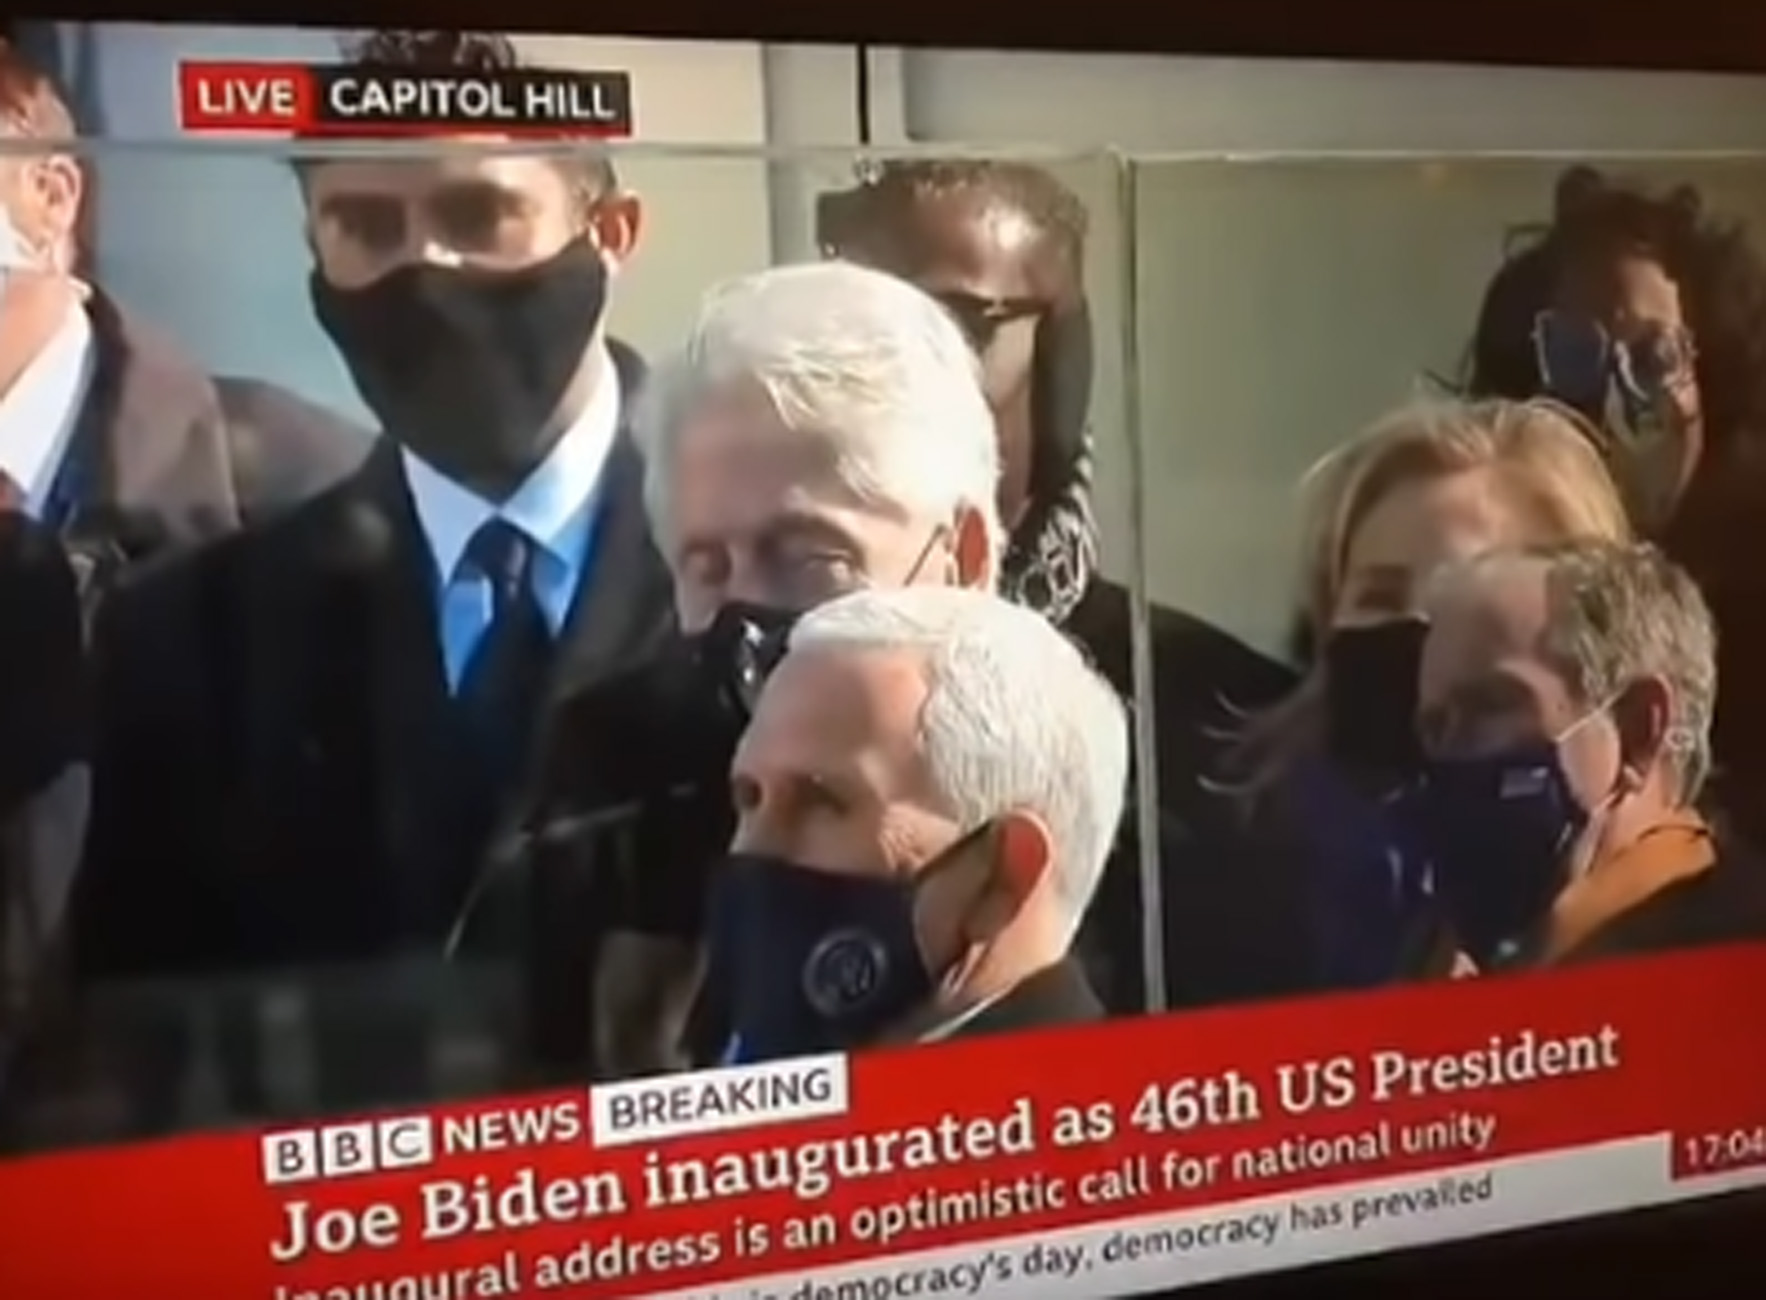 Viral ο Μπιλ Κλίντον – Κοιμήθηκε στην ομιλία του Τζο Μπάιντεν – ΒΙΝΤΕΟ